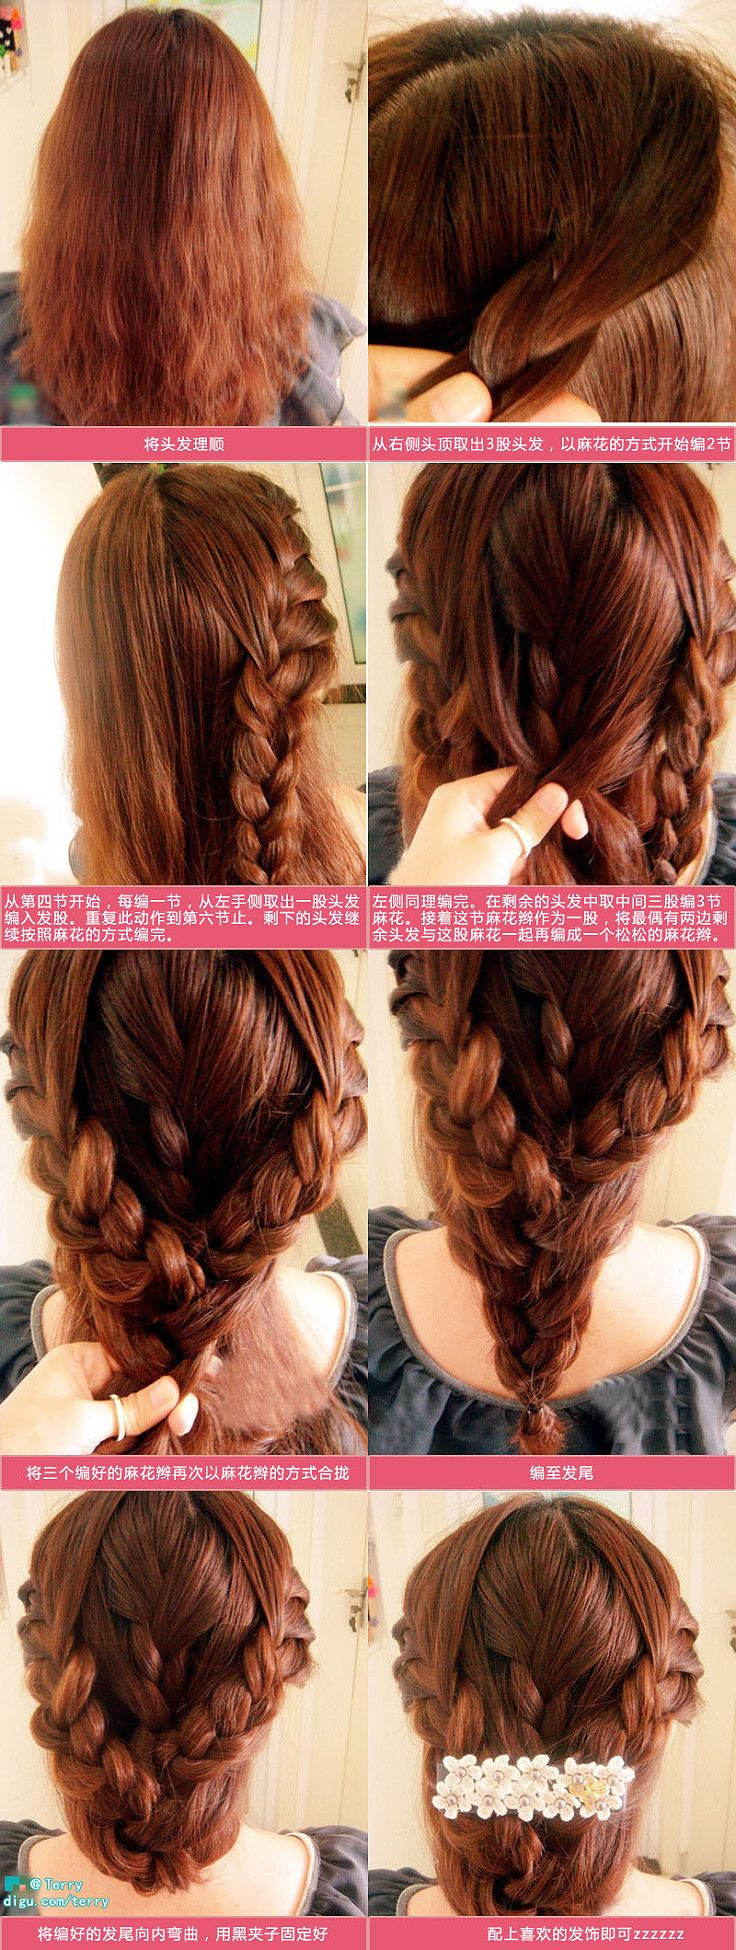 Haircut for boys age 10 multiple braids updo for thick hair  korean makeup tutorials